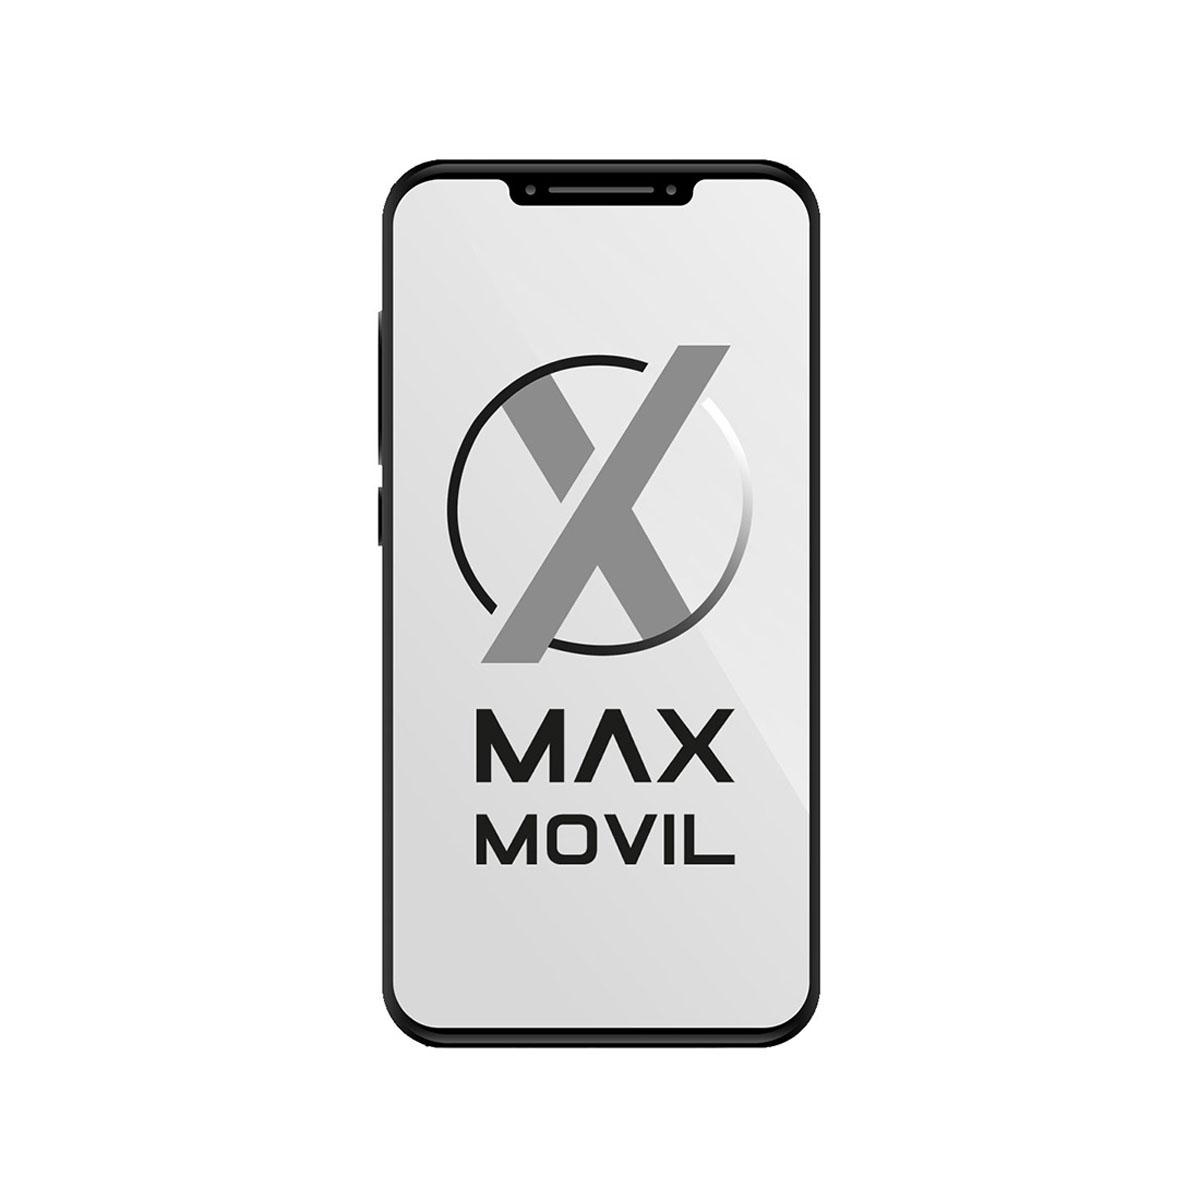 Kit Manos Libres Portátil con Bluetooth Nokia BH-111 magenta